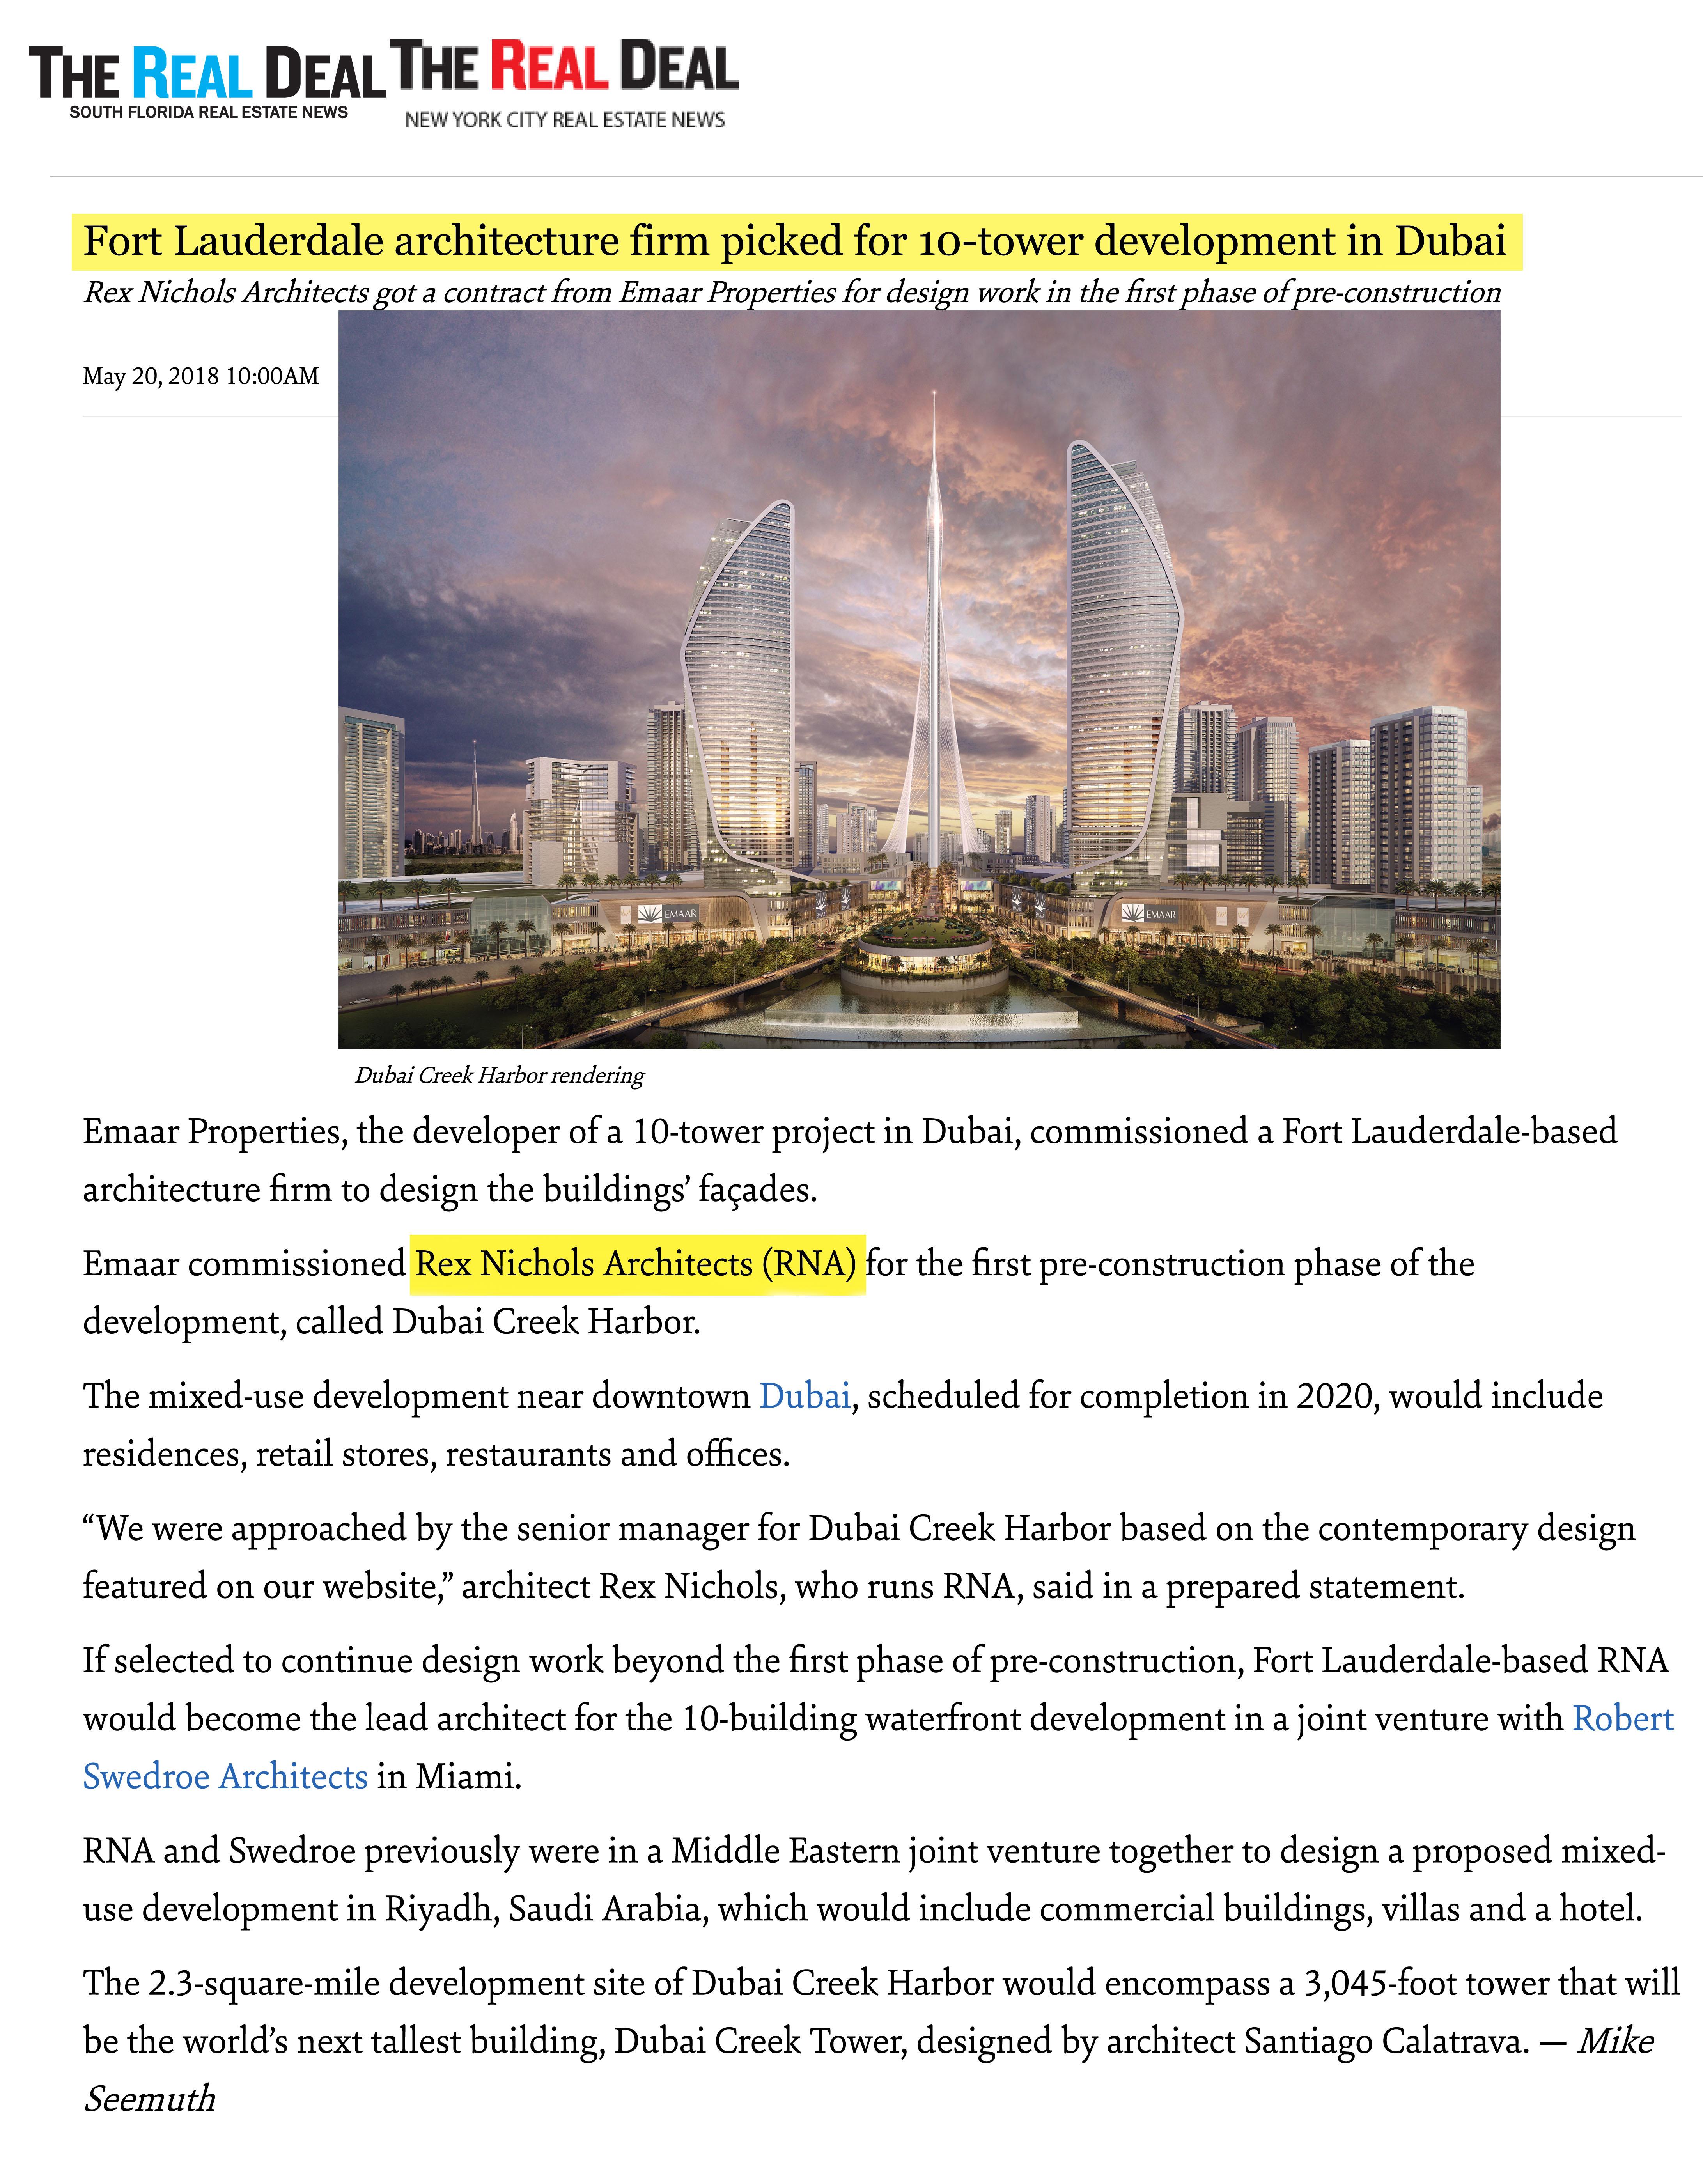 Top Miami Architects | Dubai | RNA